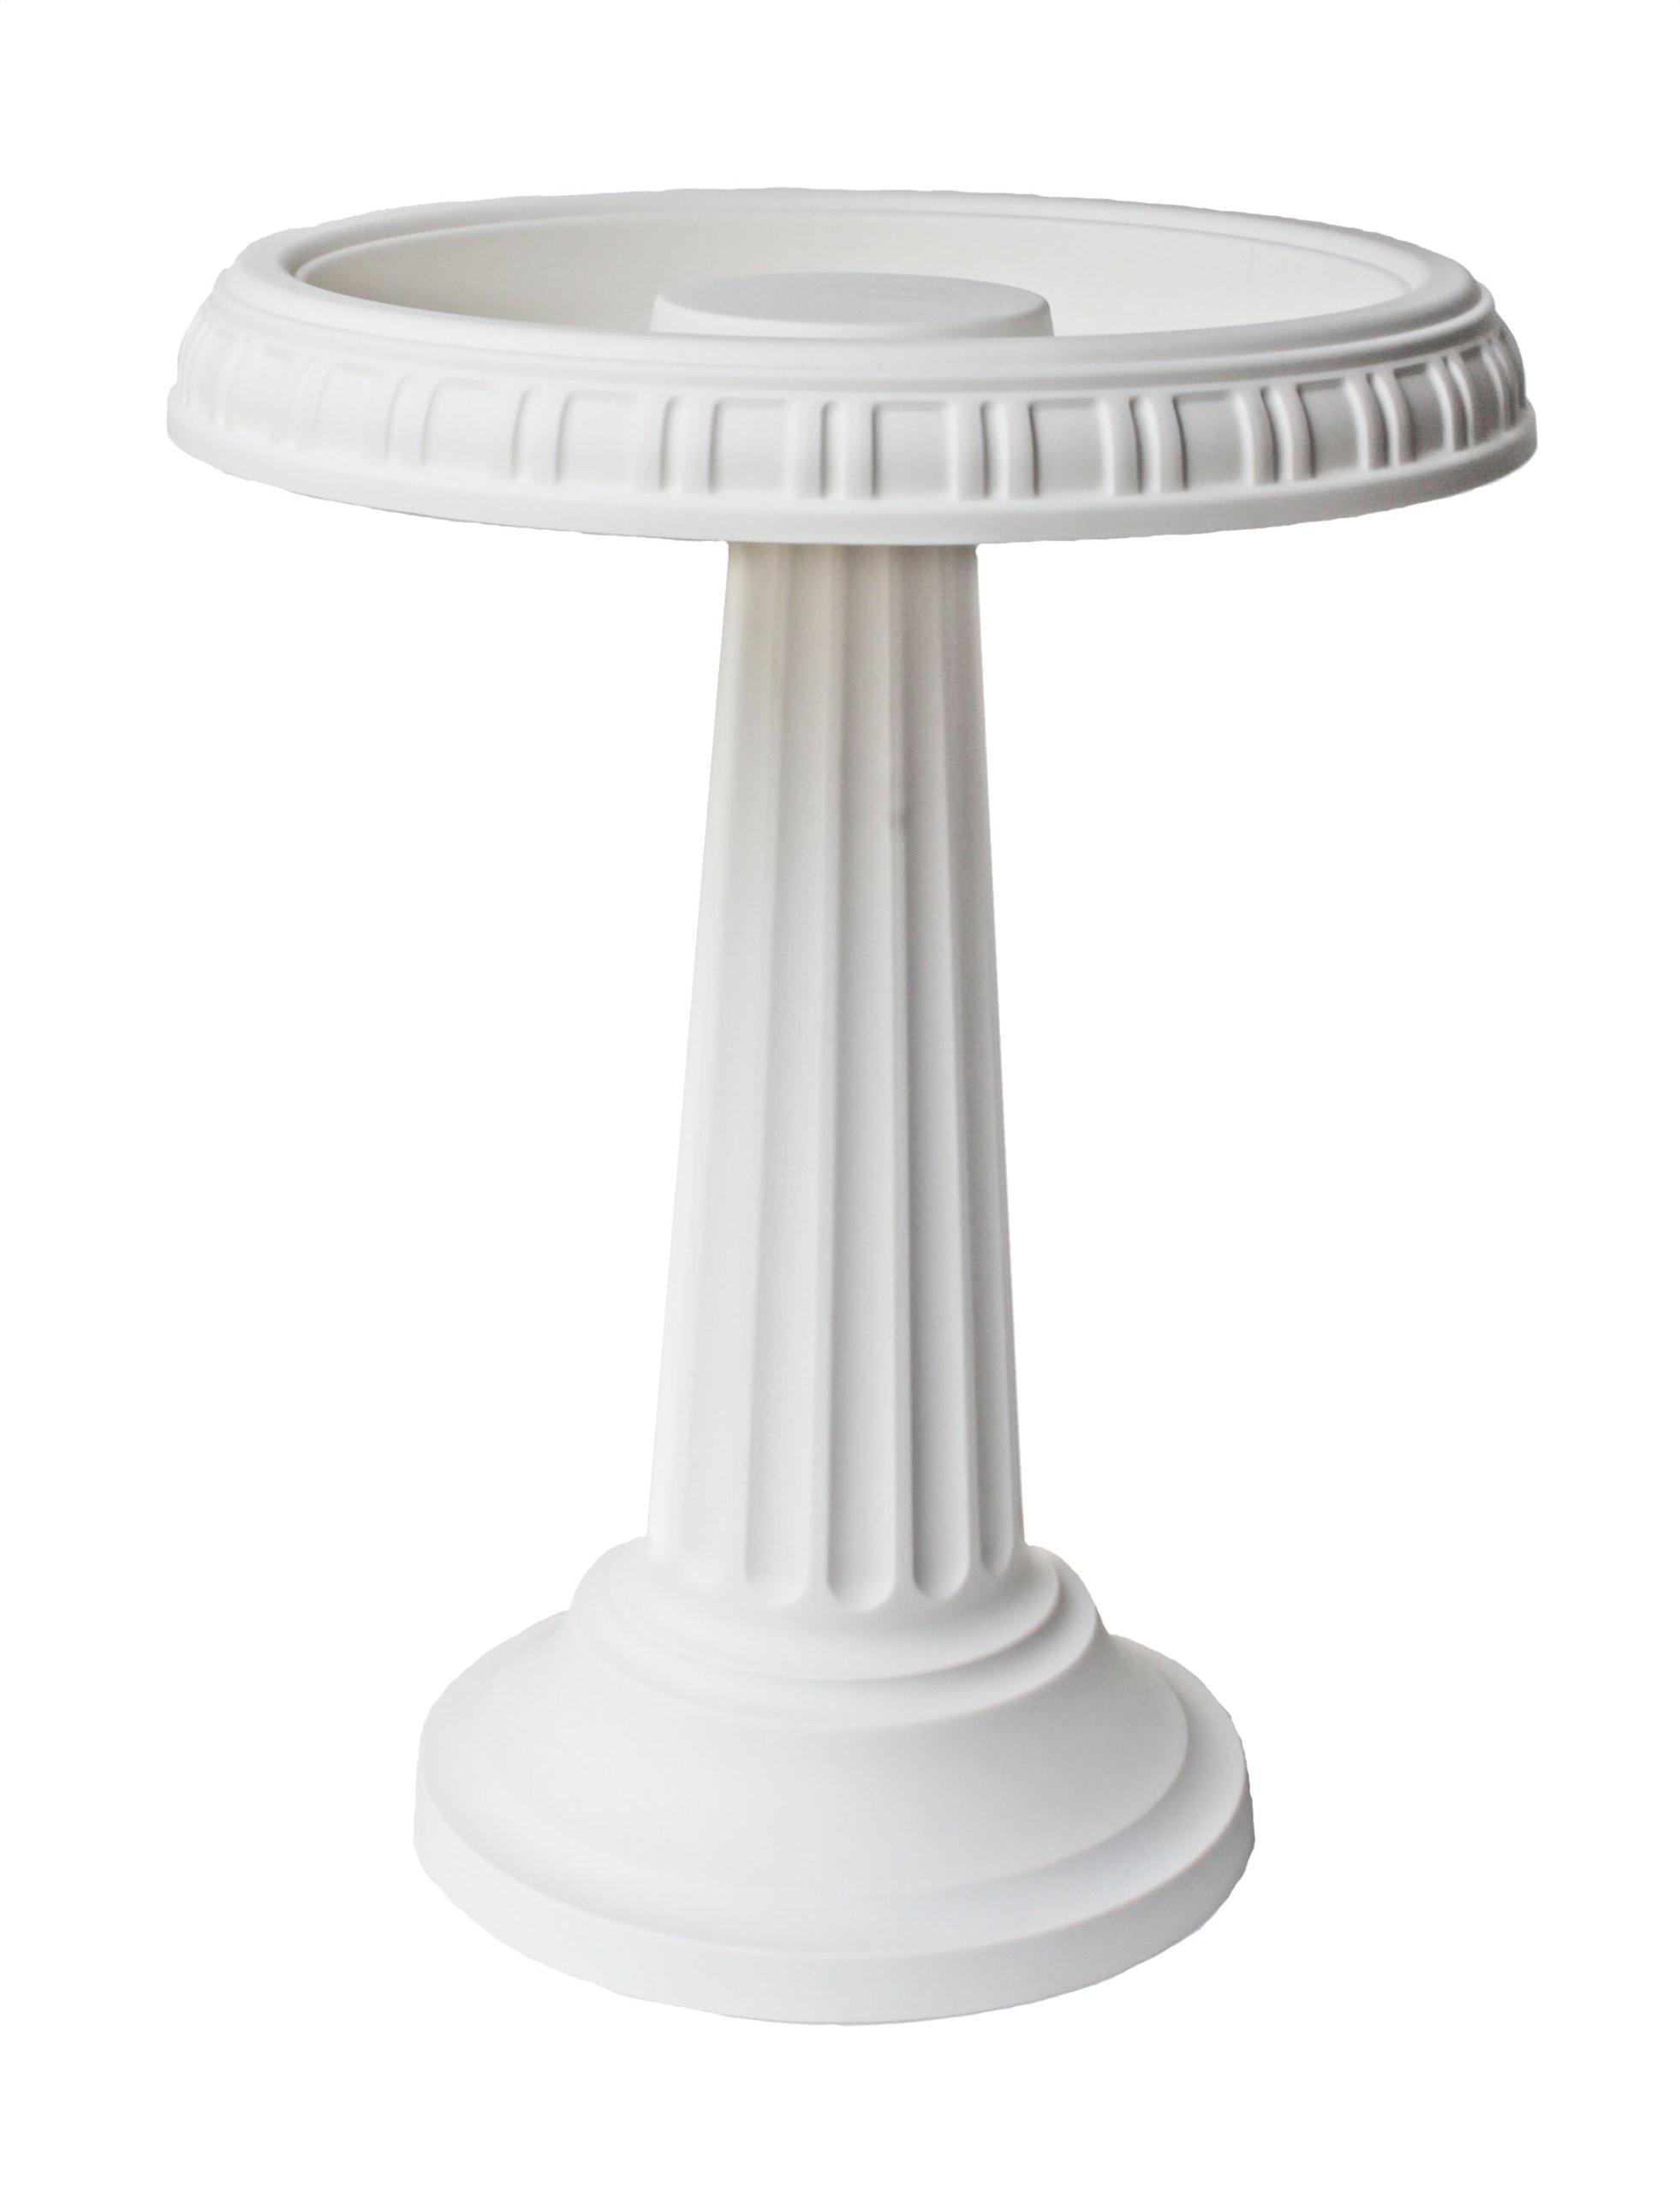 Bloem Grecian Bird Bath with Pedestal, 24'' x 19'', White (BB2-10)